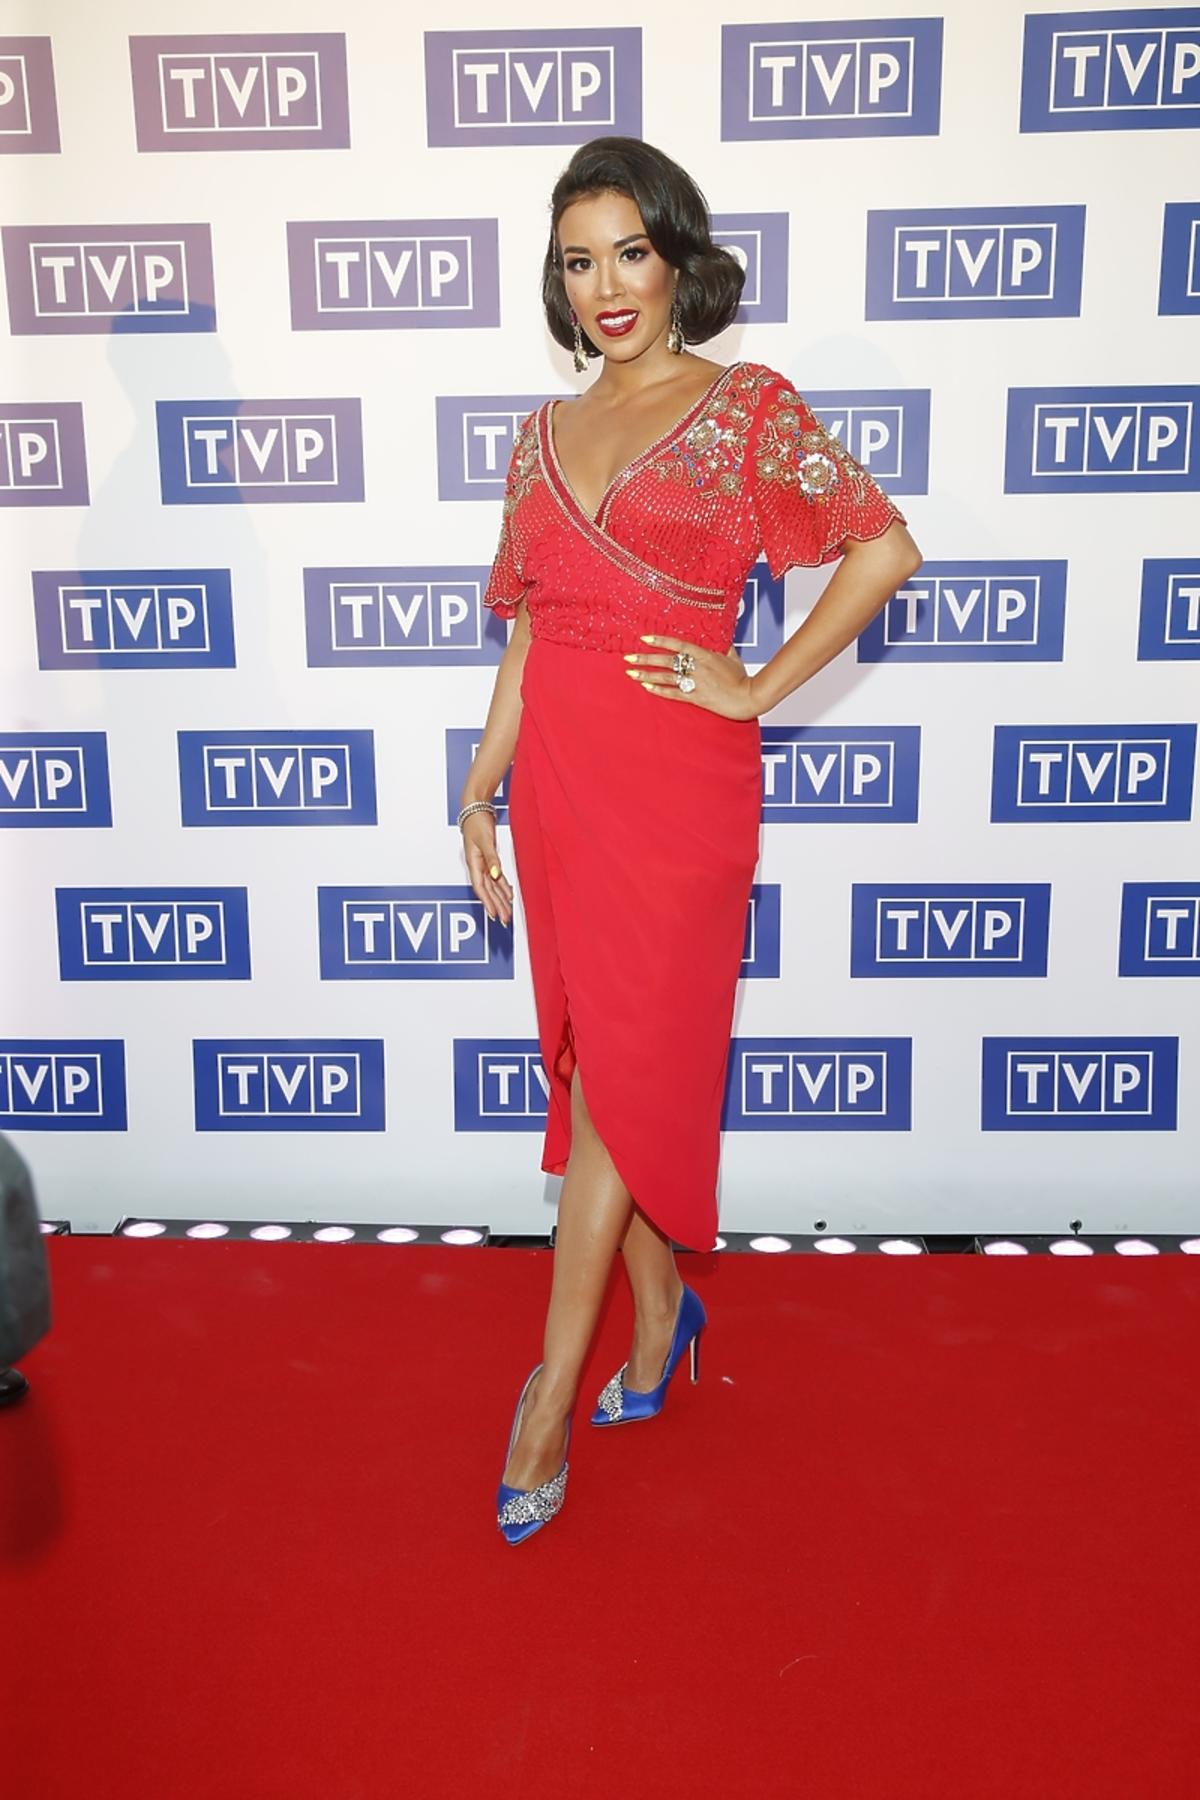 Macademian Girl na wiosennej ramówce TVP